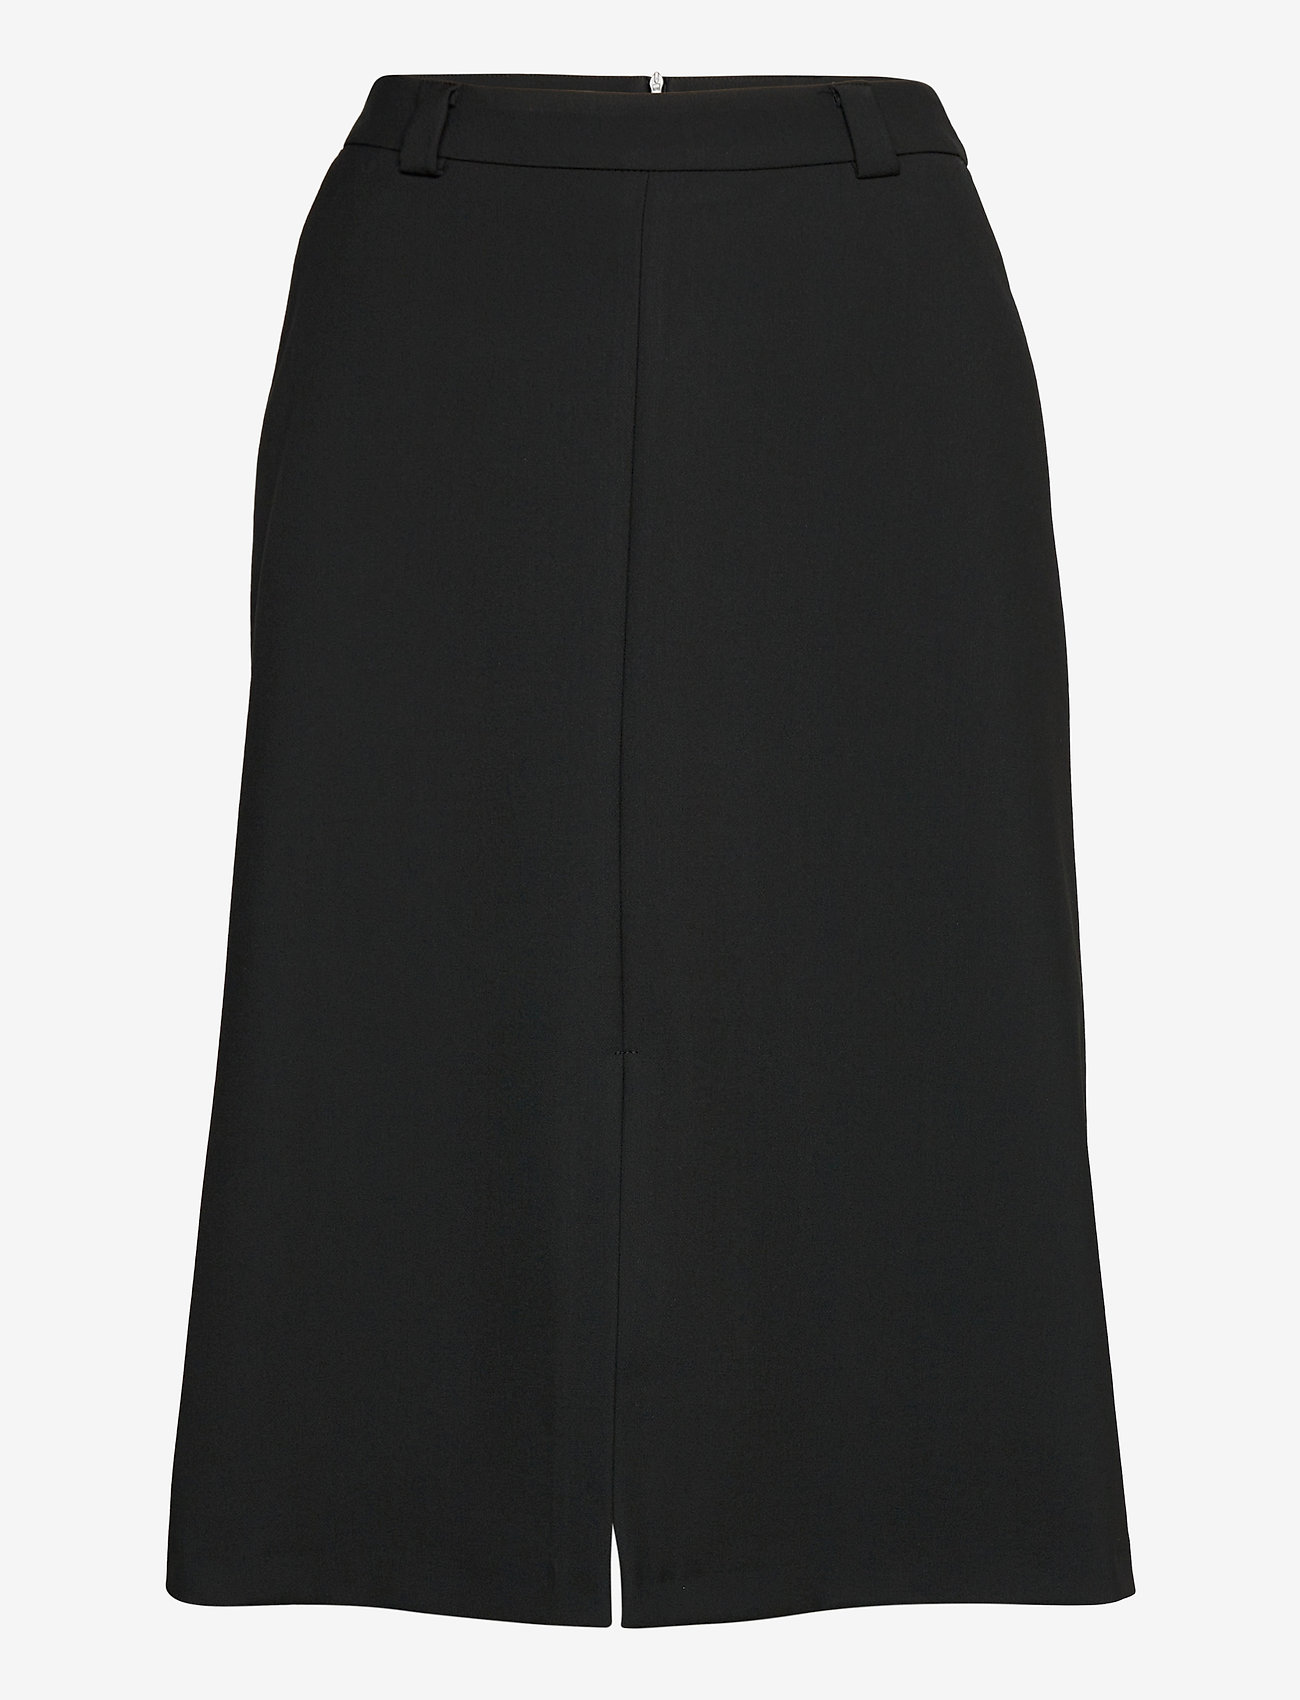 Marimekko - PUJOTELLA SOLID SKIRT - midinederdele - black - 1